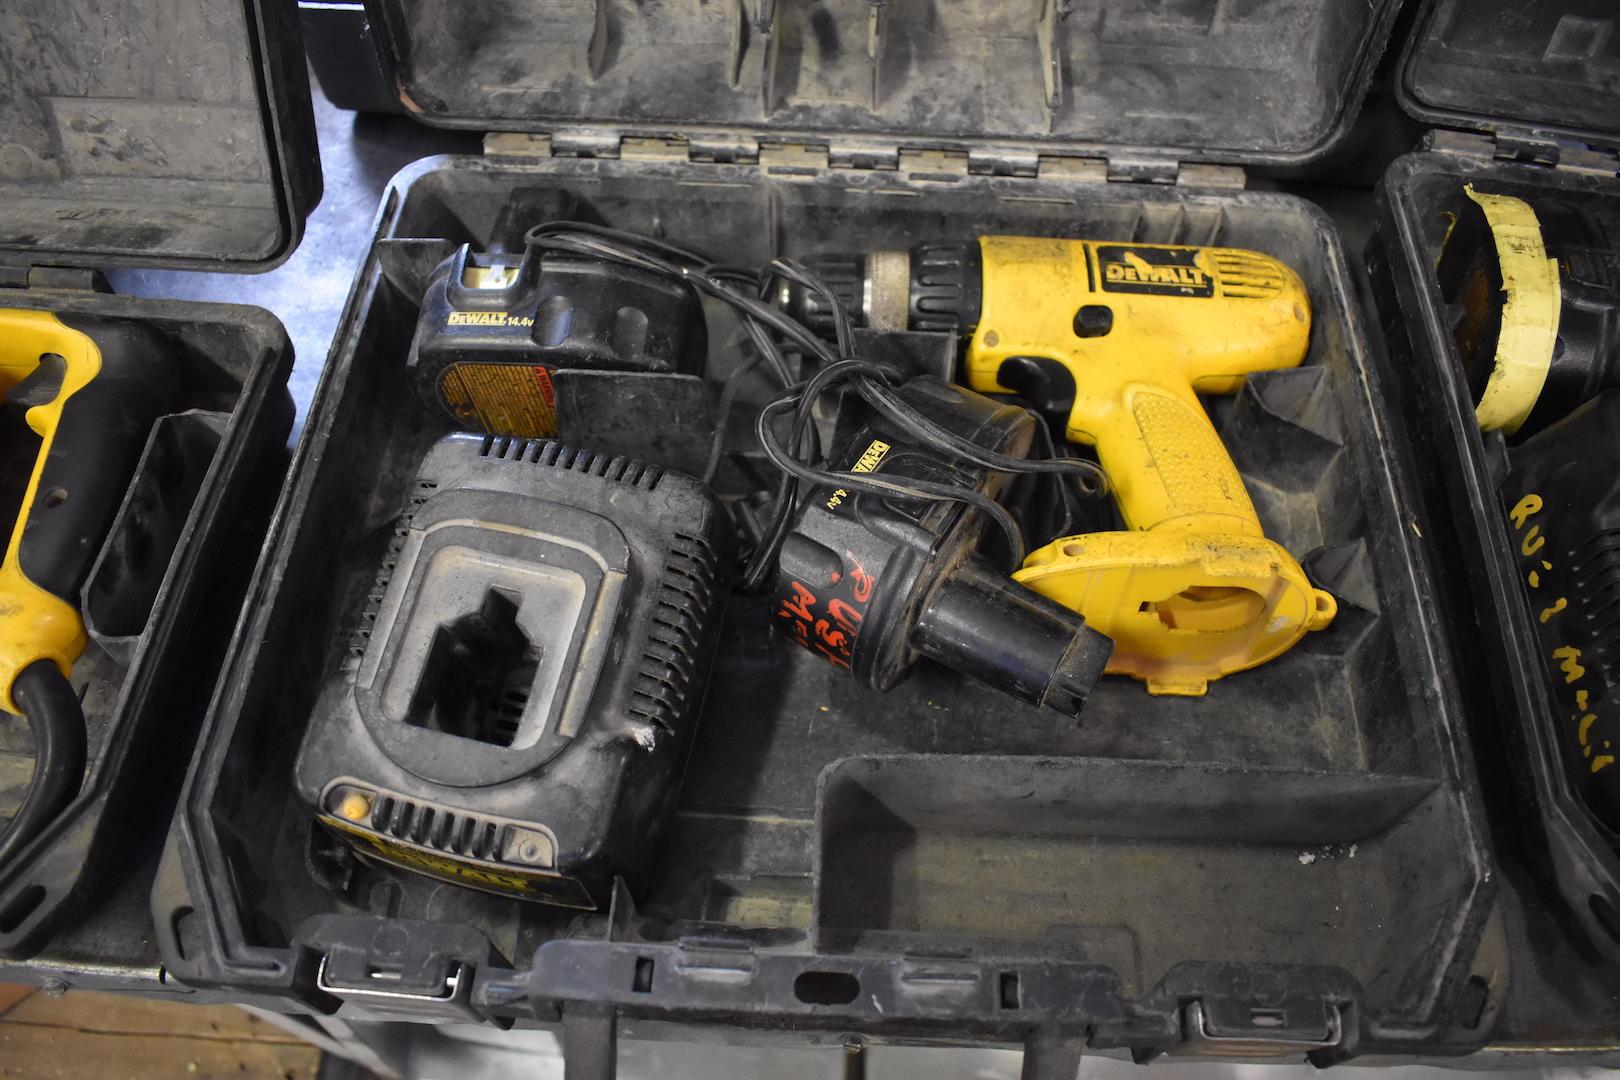 "Lot 4 - Dewalt Model DW328 3/8"" Variable Speed Cordless Drill/Driver"